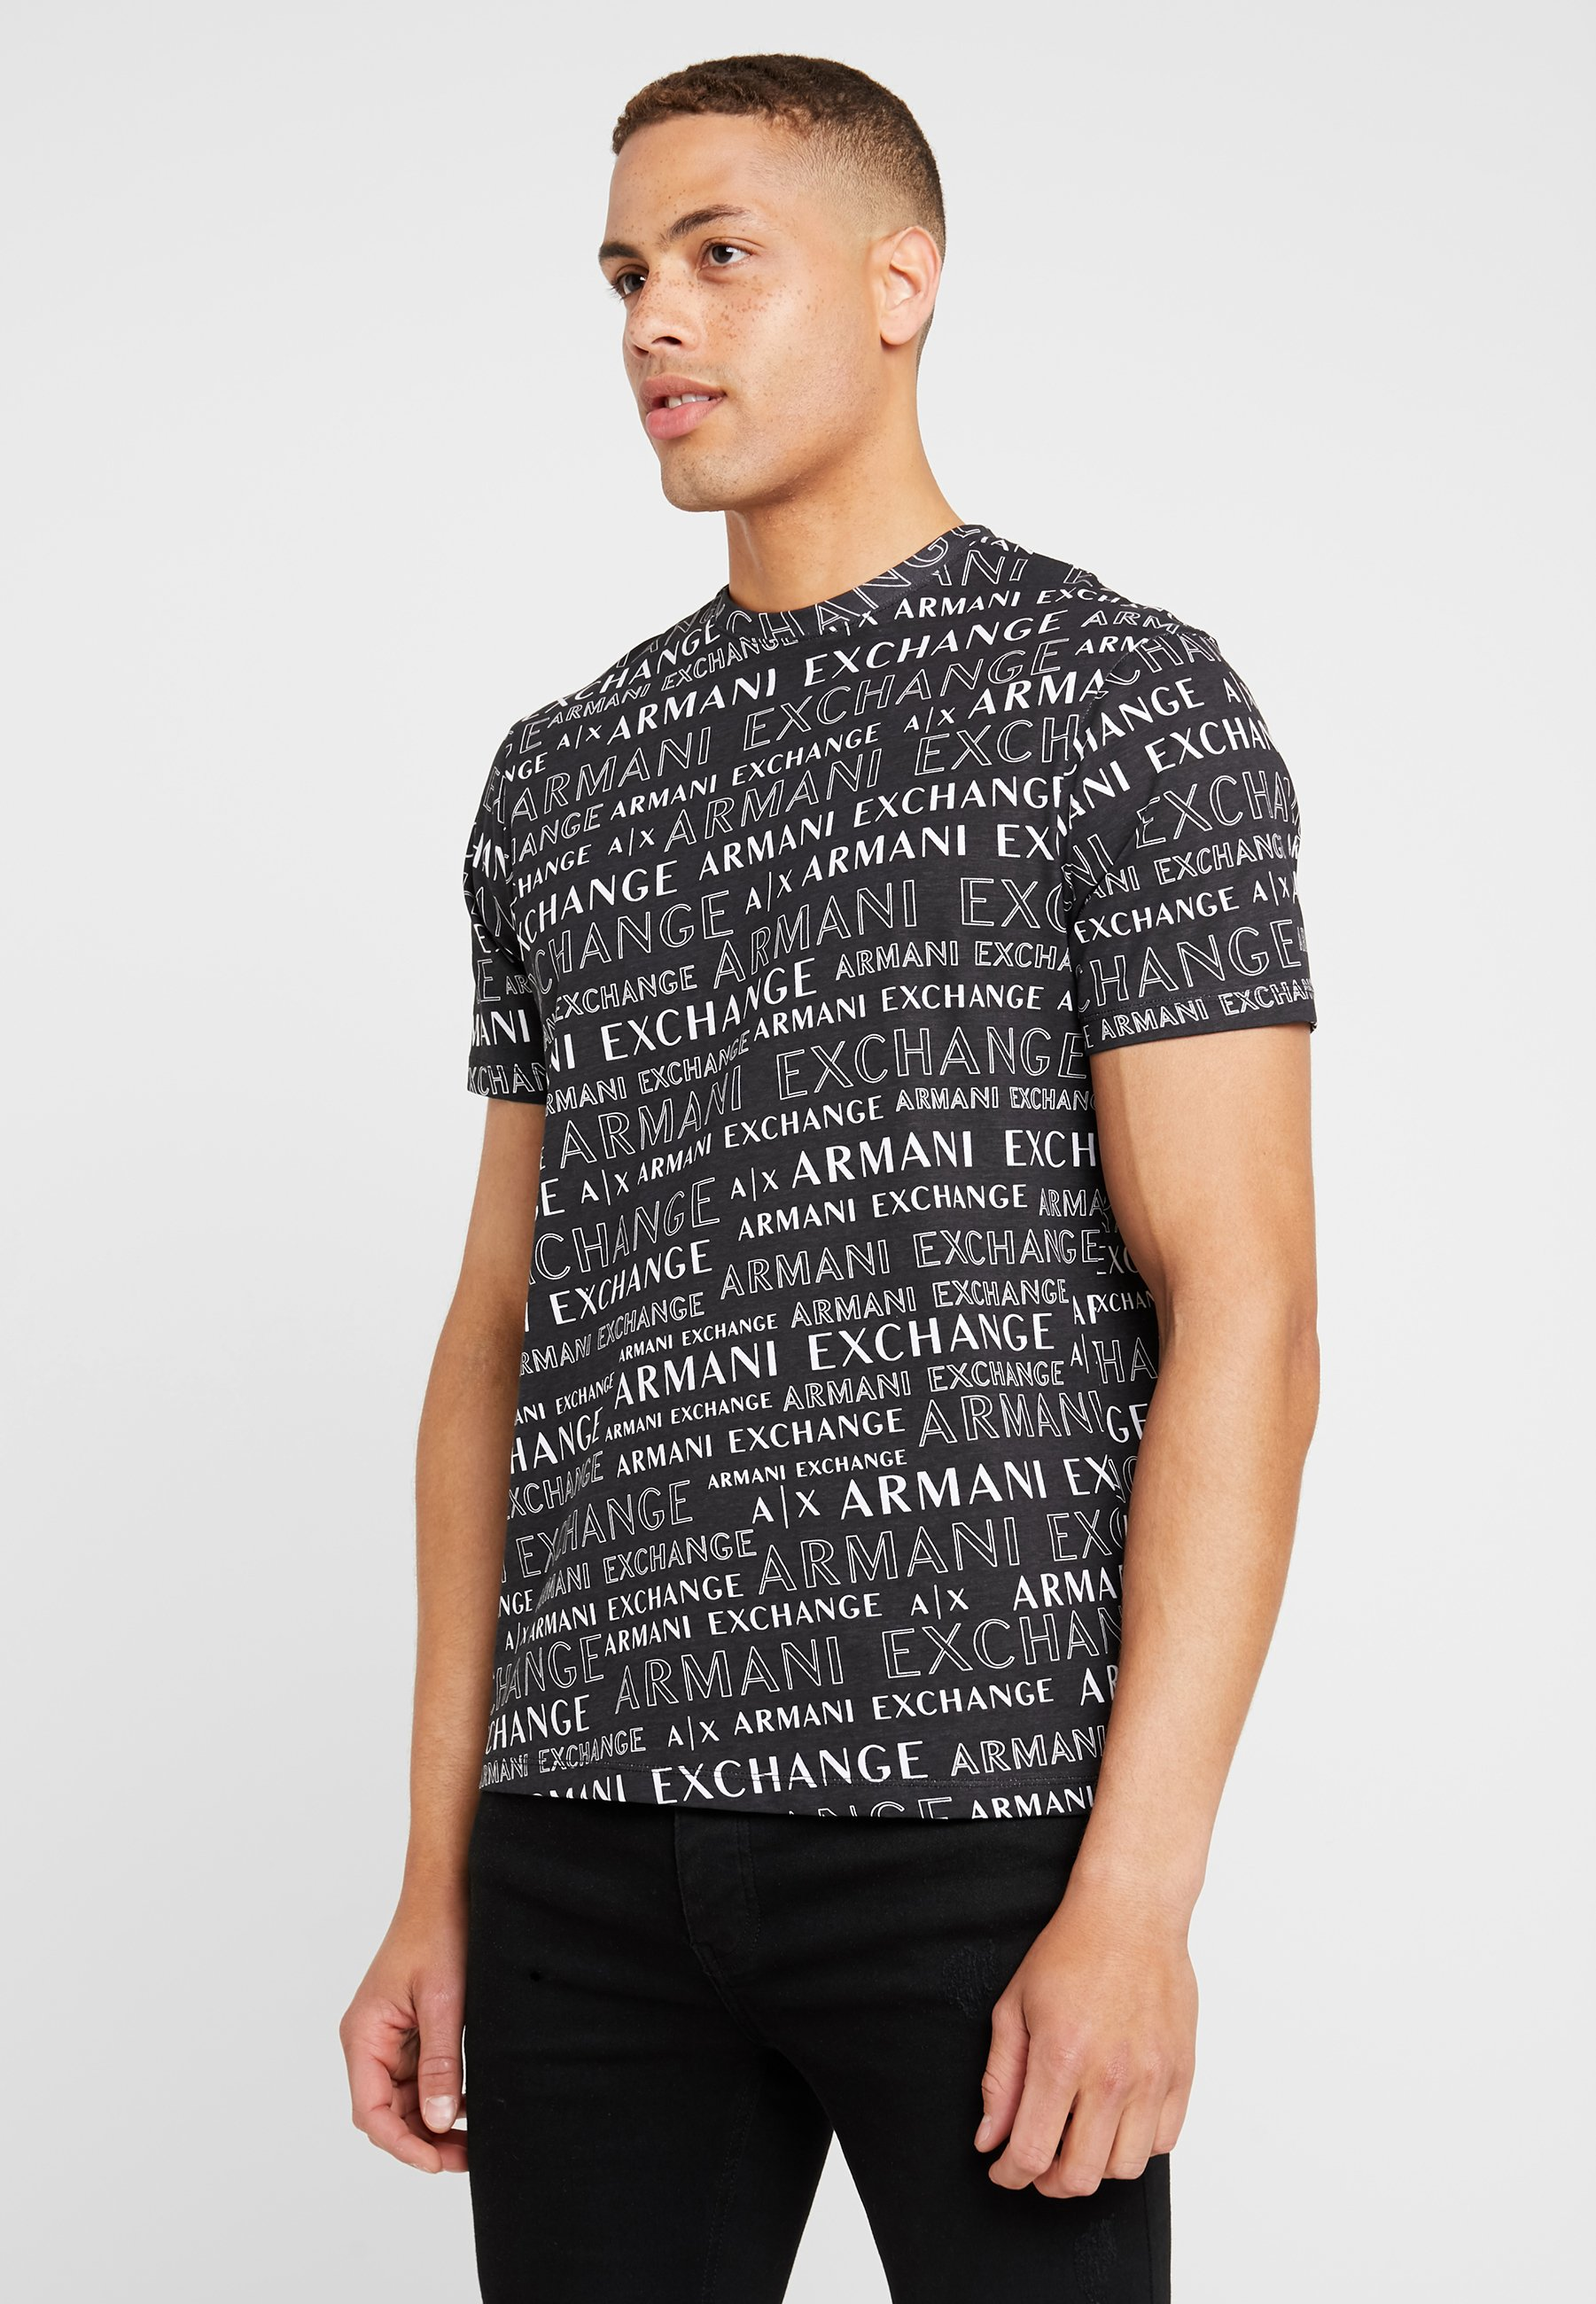 Armani Exchange Exchange T shirt T Exchange Armani ImpriméBlack ImpriméBlack Armani shirt IgYb6v7mfy